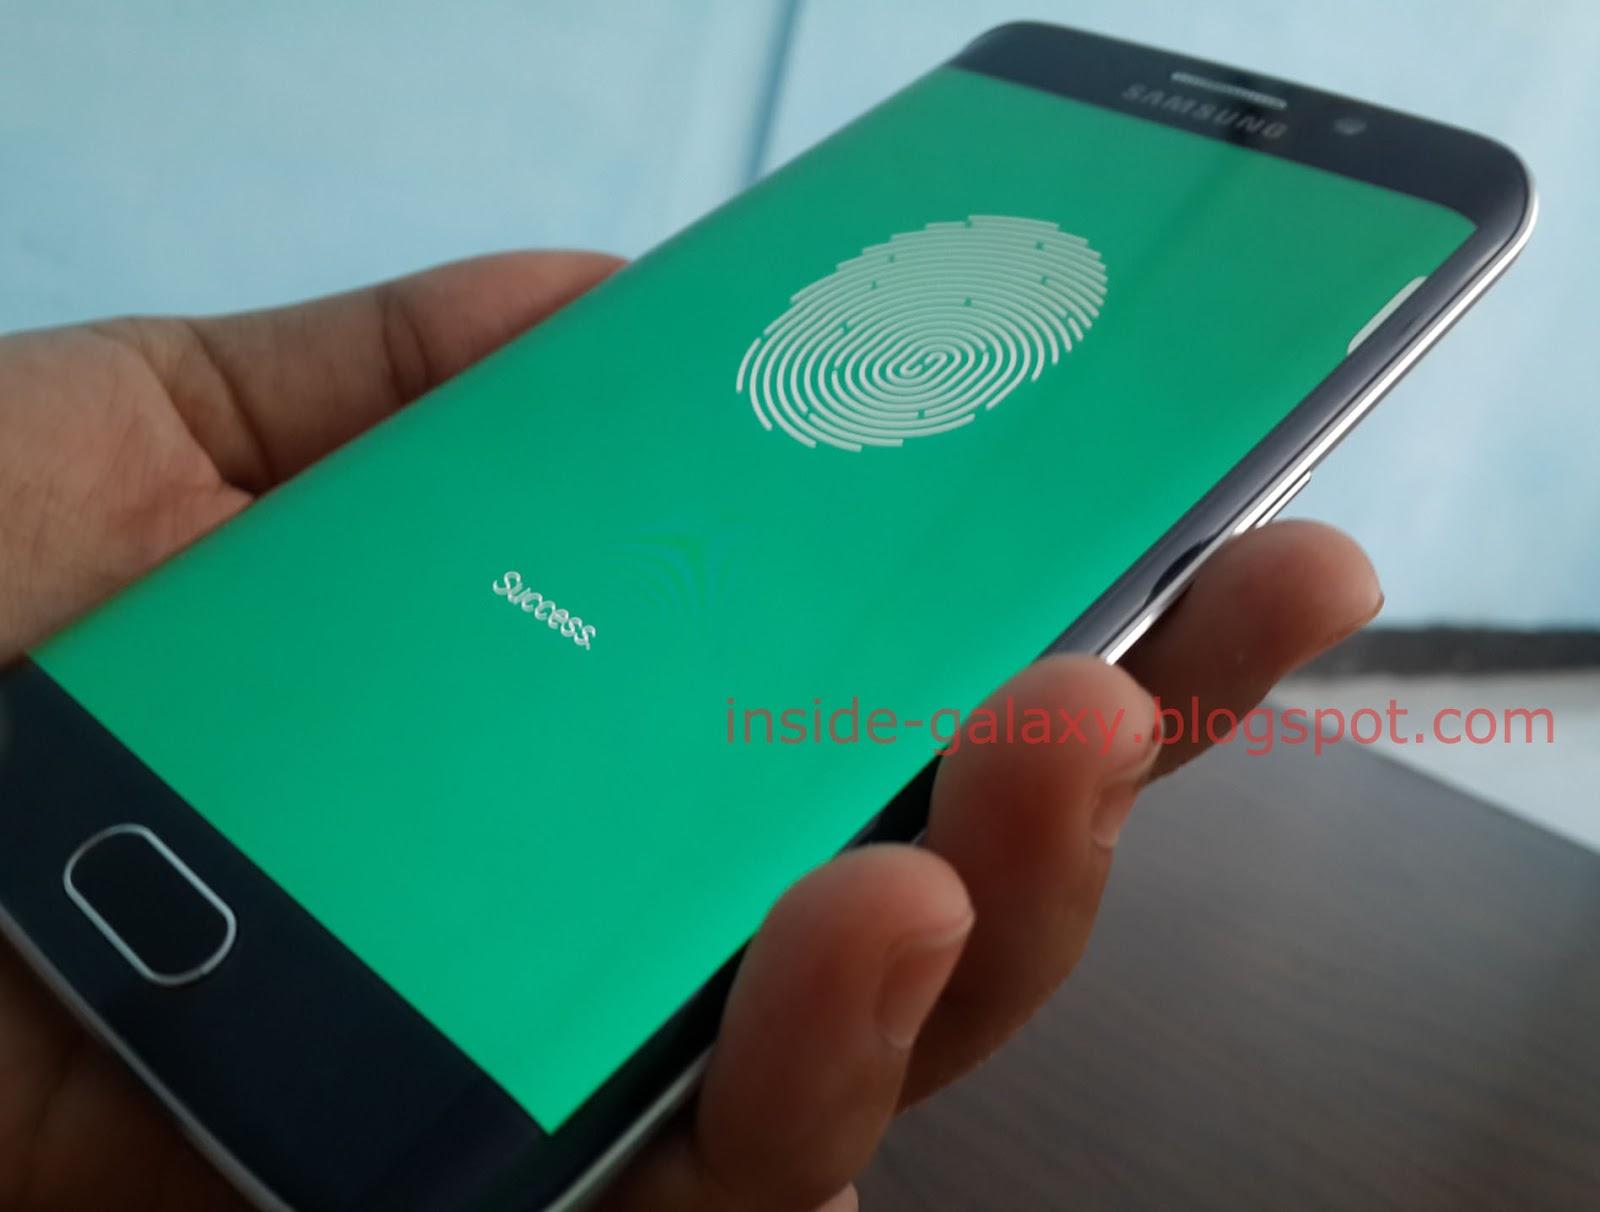 Samsung Galaxy S6 Edge: How to Use Fingerprints as Screen Lock